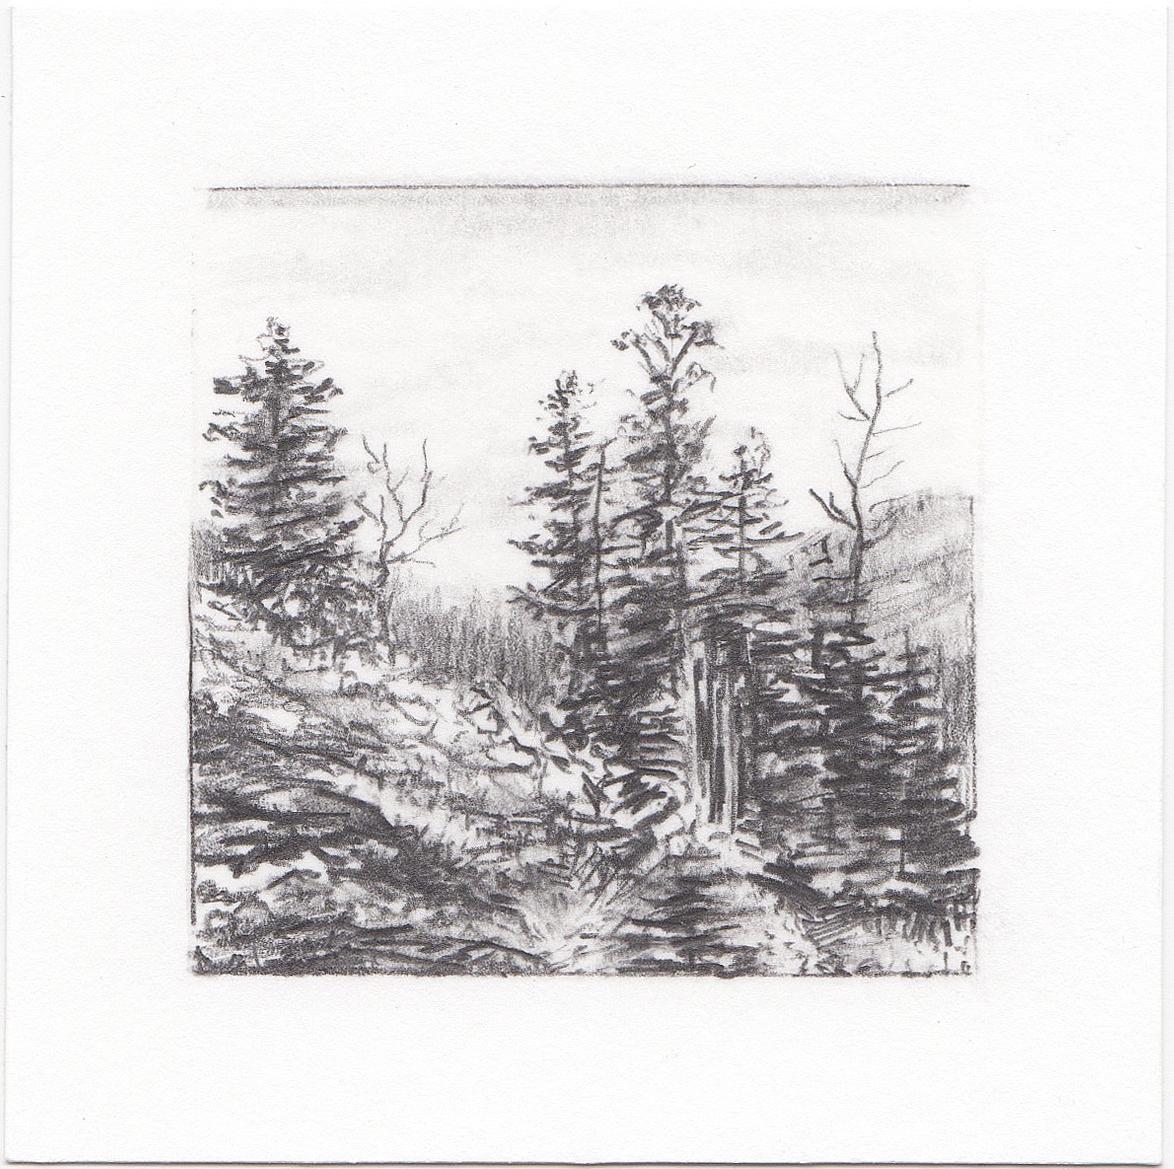 #17 Mill D South Fork, Big Cottonwood Canyon, Utah | 3x3 | graphite